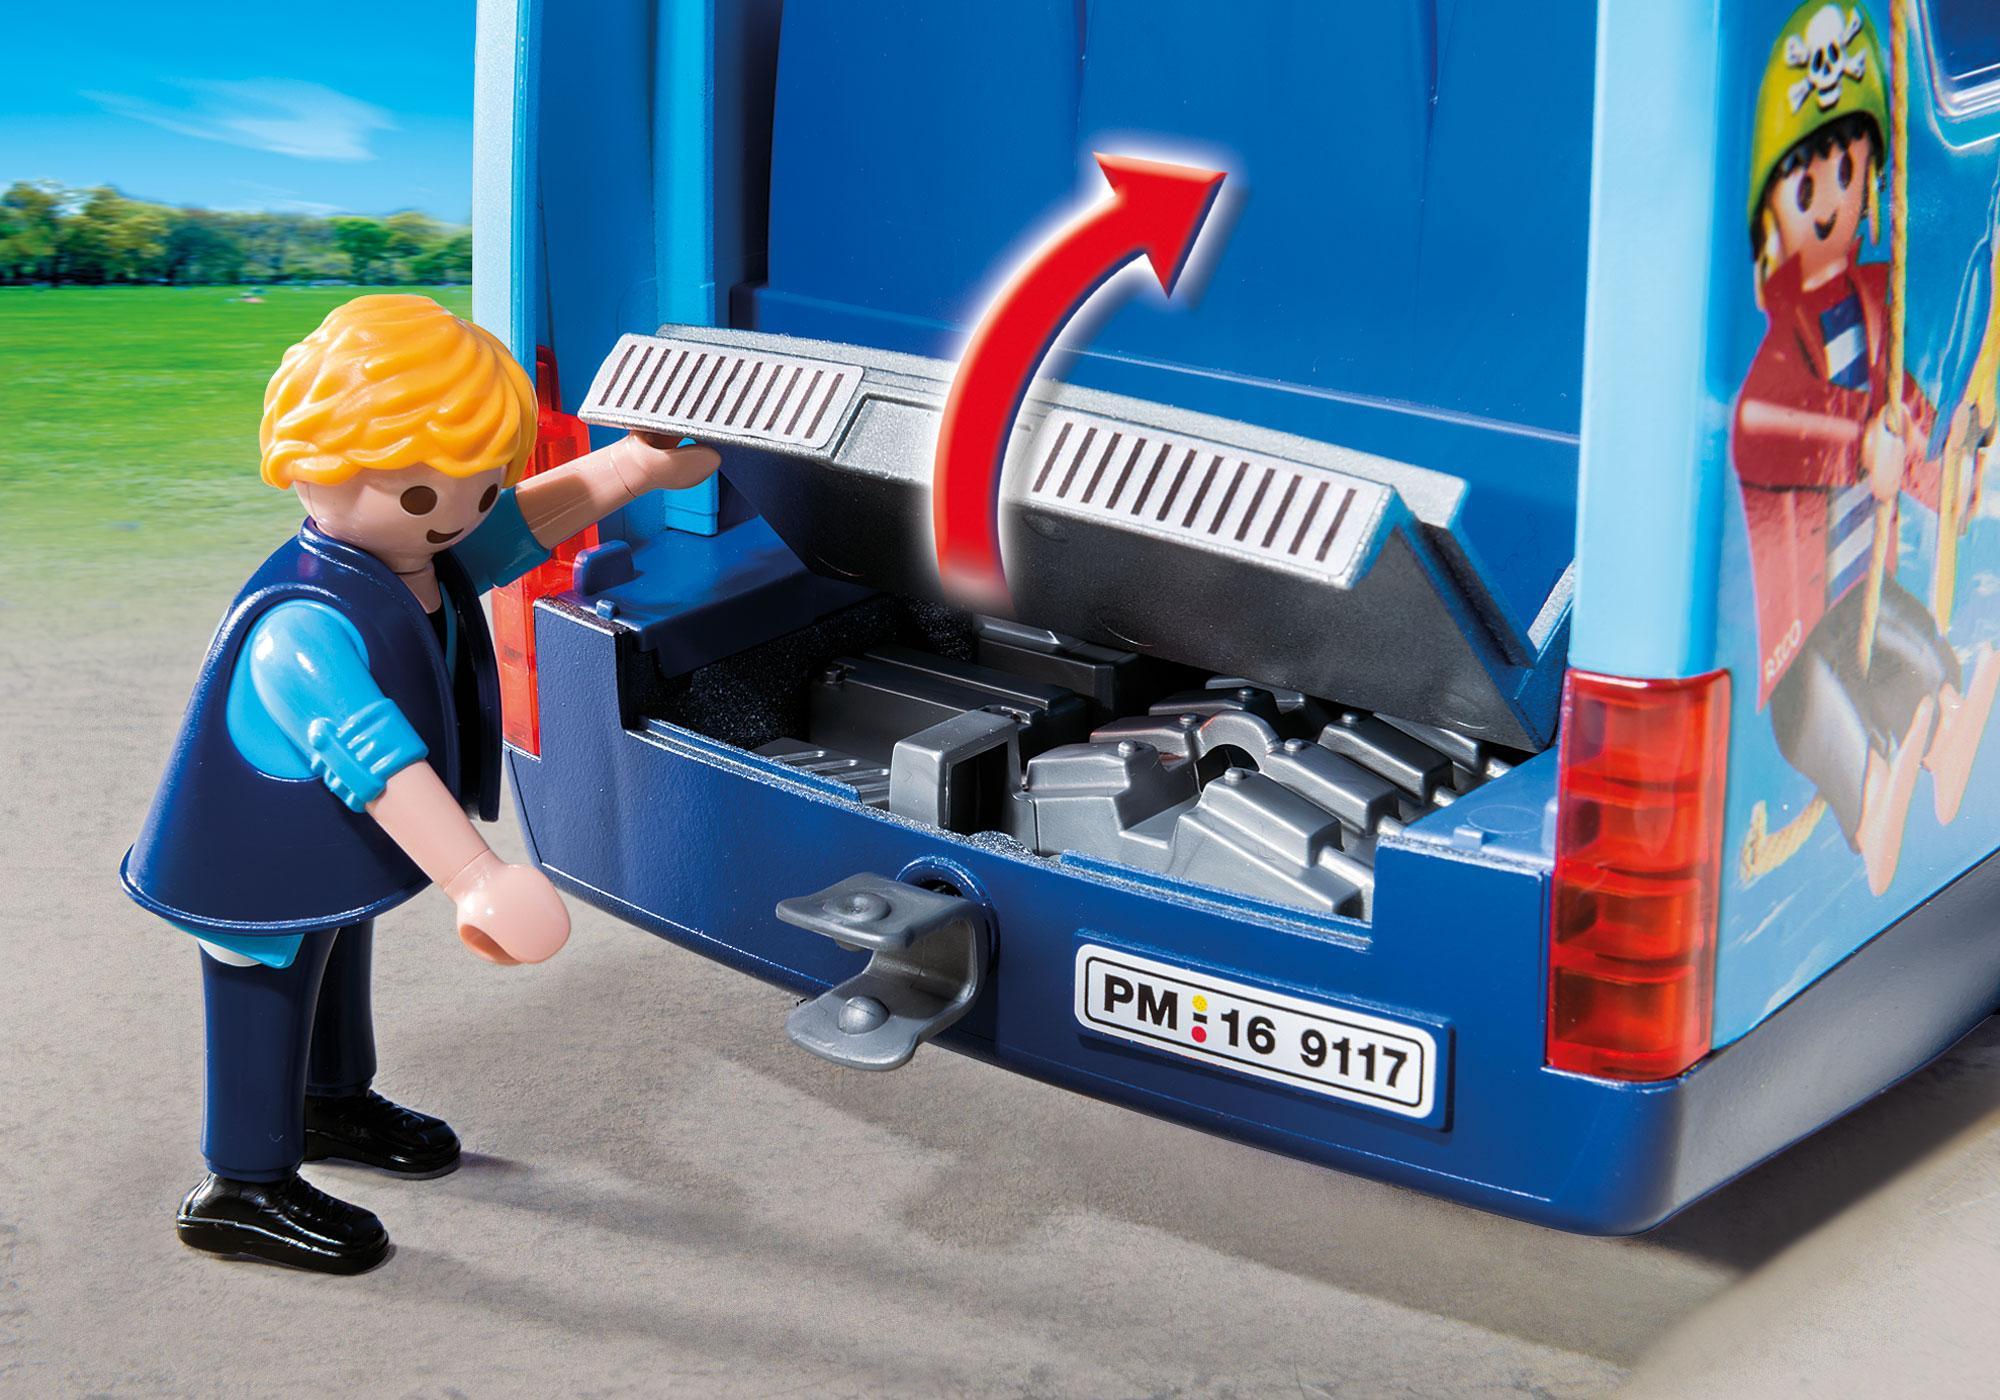 http://media.playmobil.com/i/playmobil/9117_product_extra4/Schulbus Fun Park